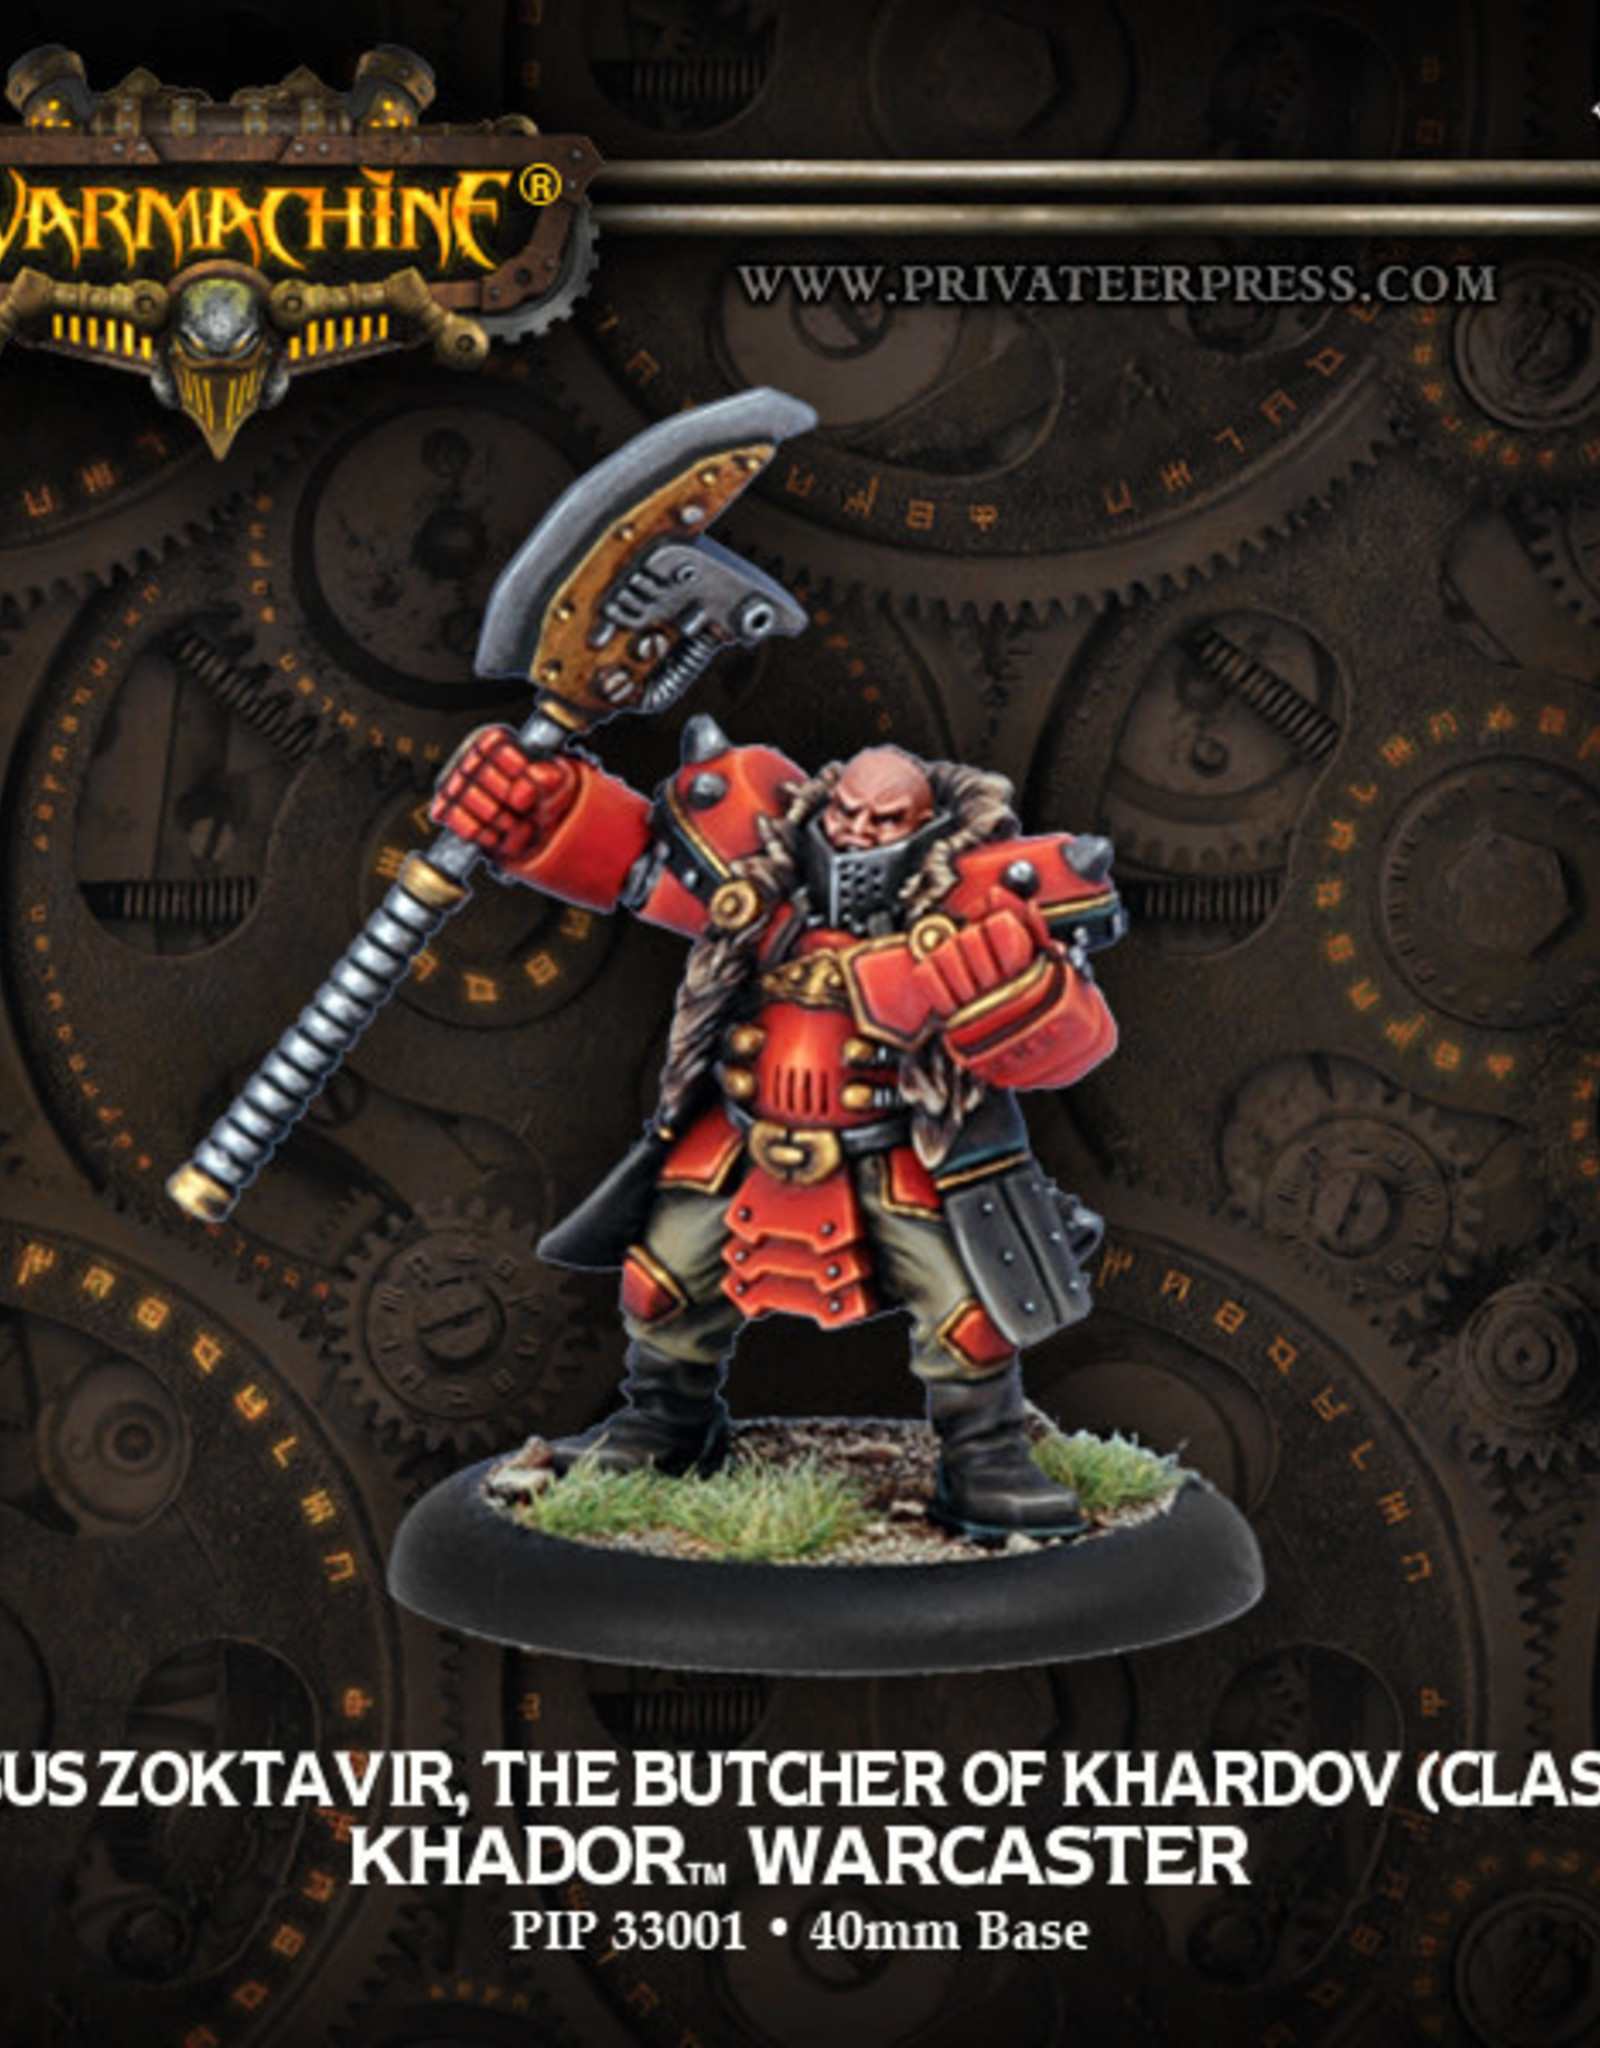 Warmachine Khador - The Butcher of Khardov